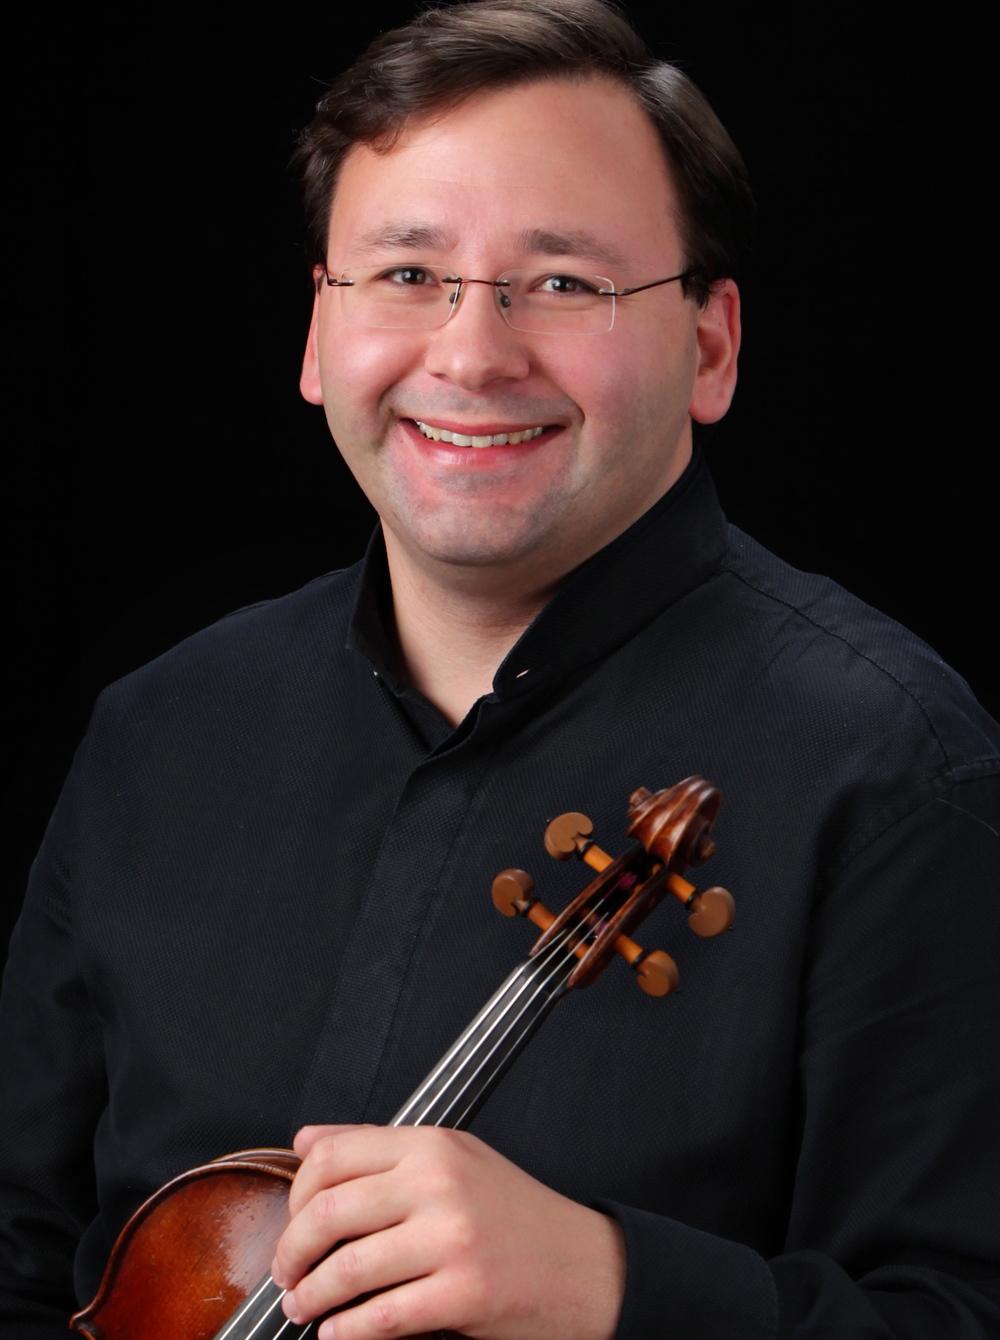 Hartmut Ometzberger